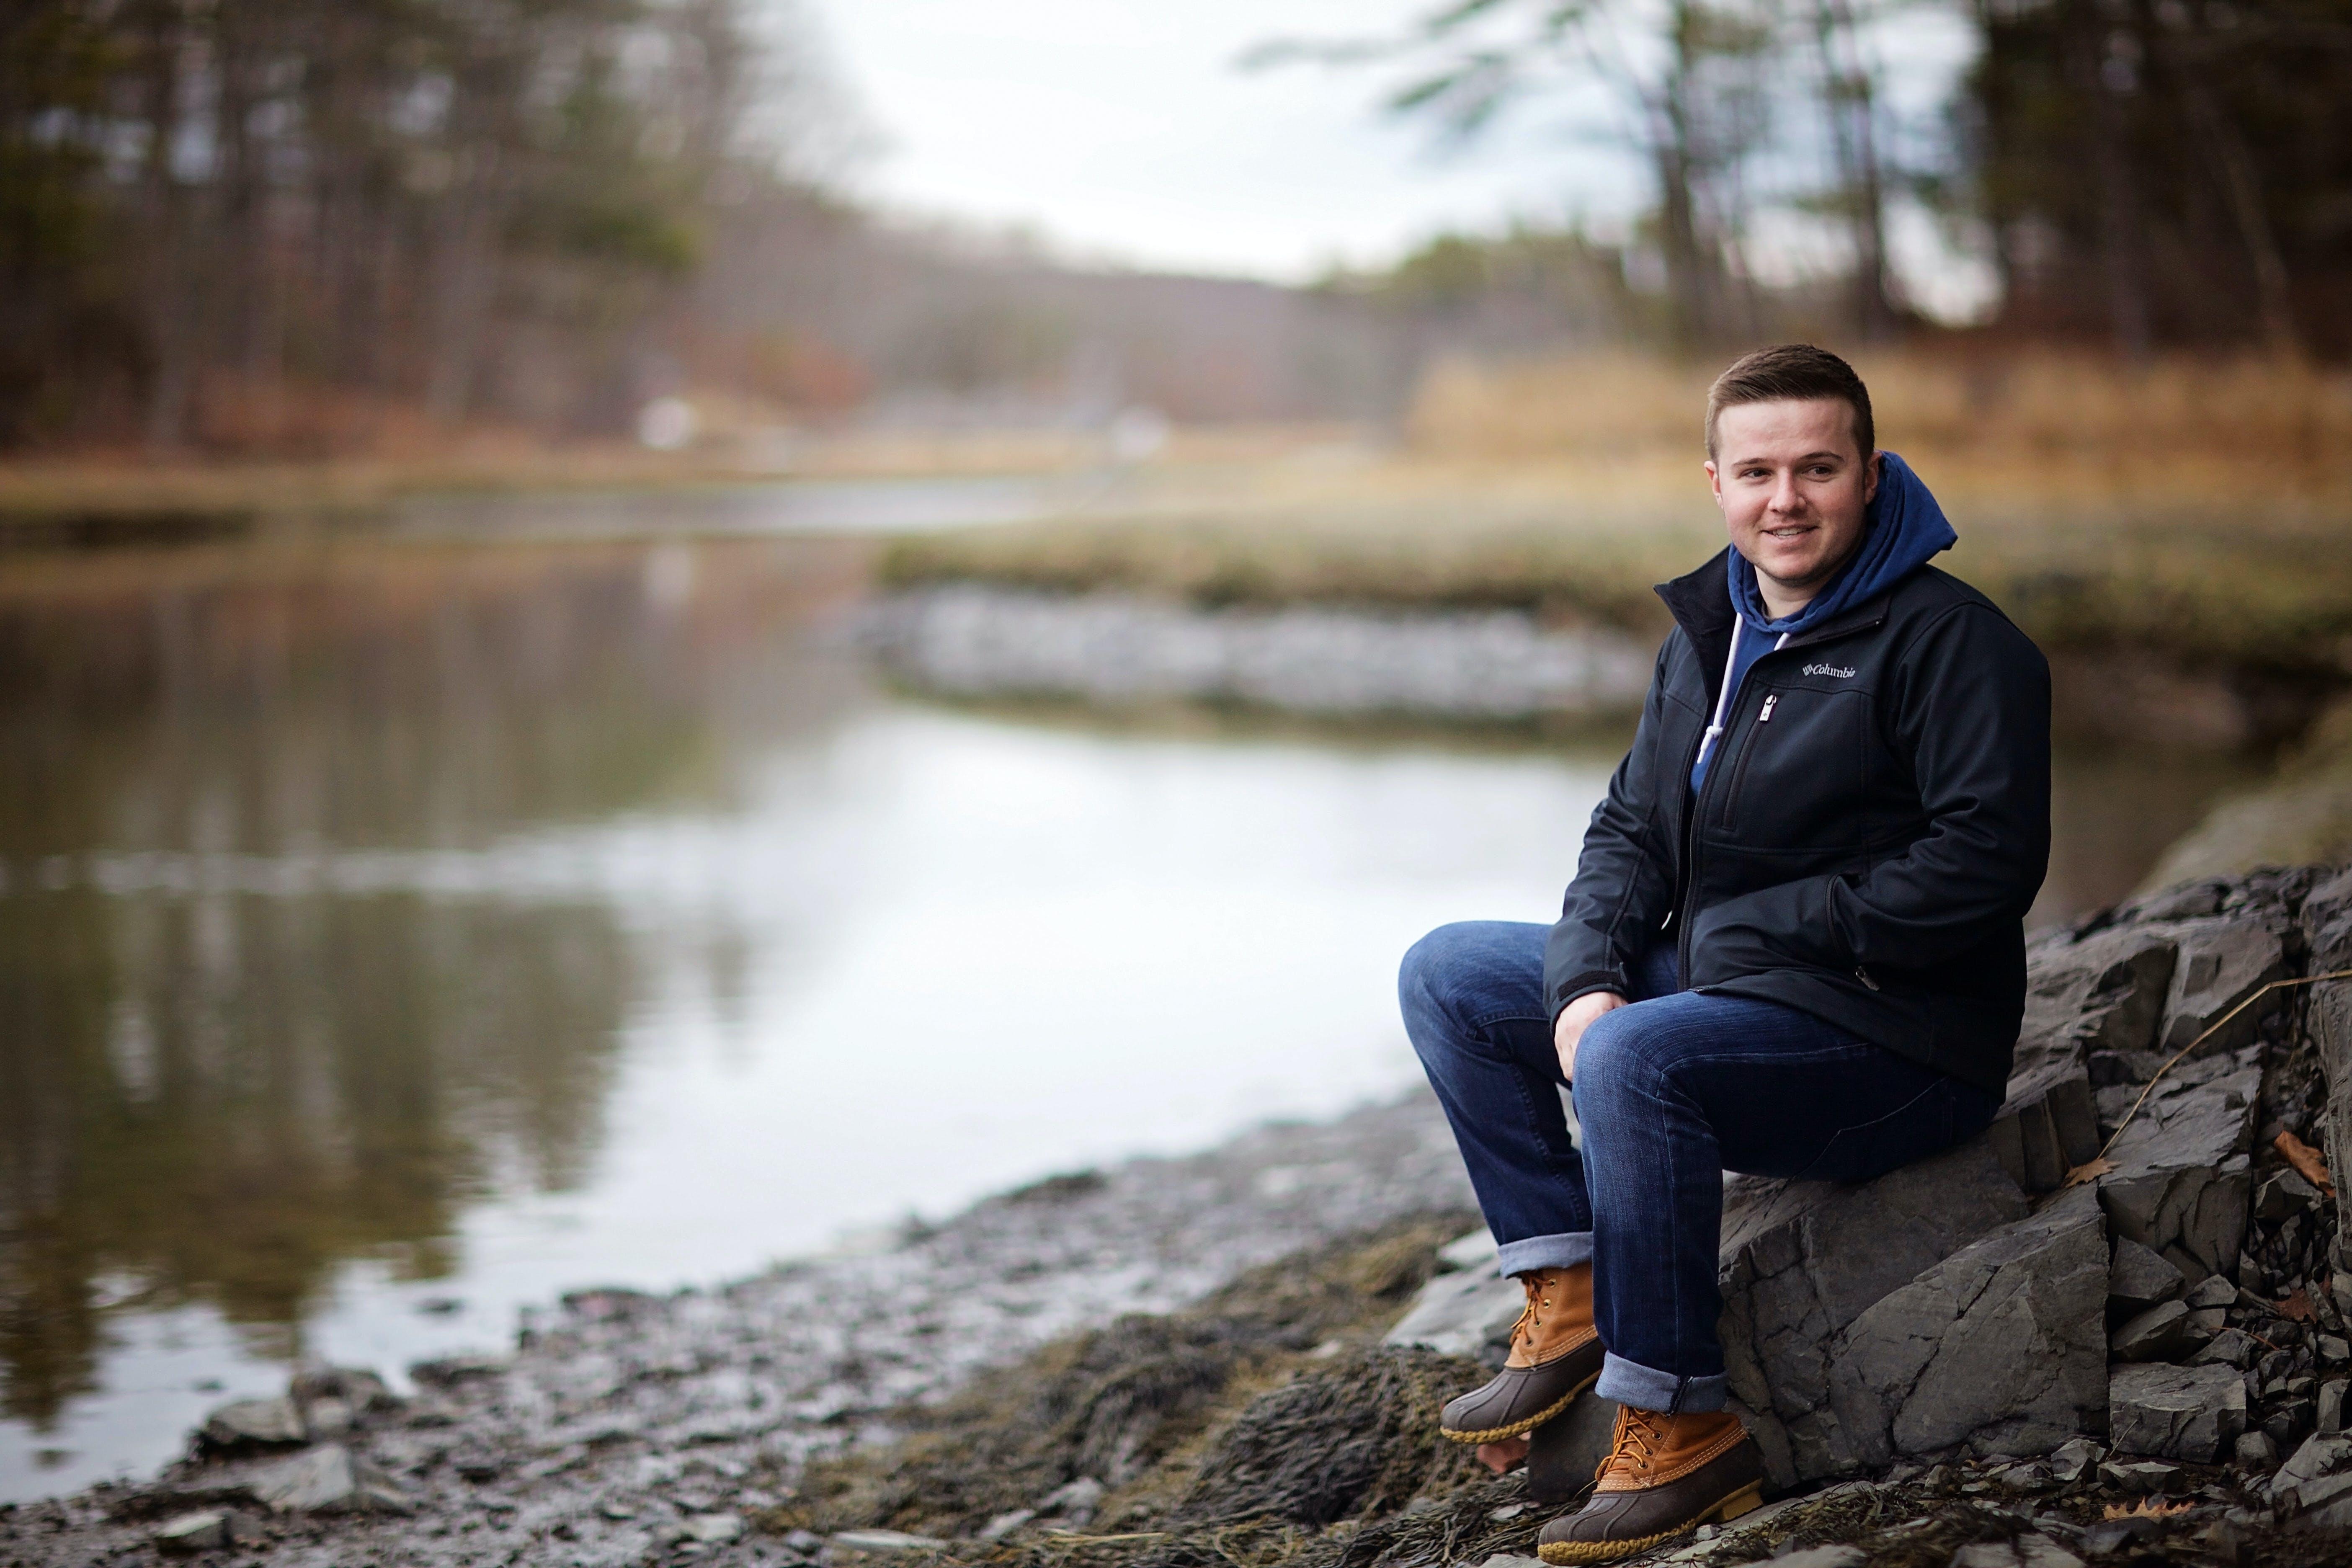 Man Wearing Black Jacket Sitting on Gray Stone Near River